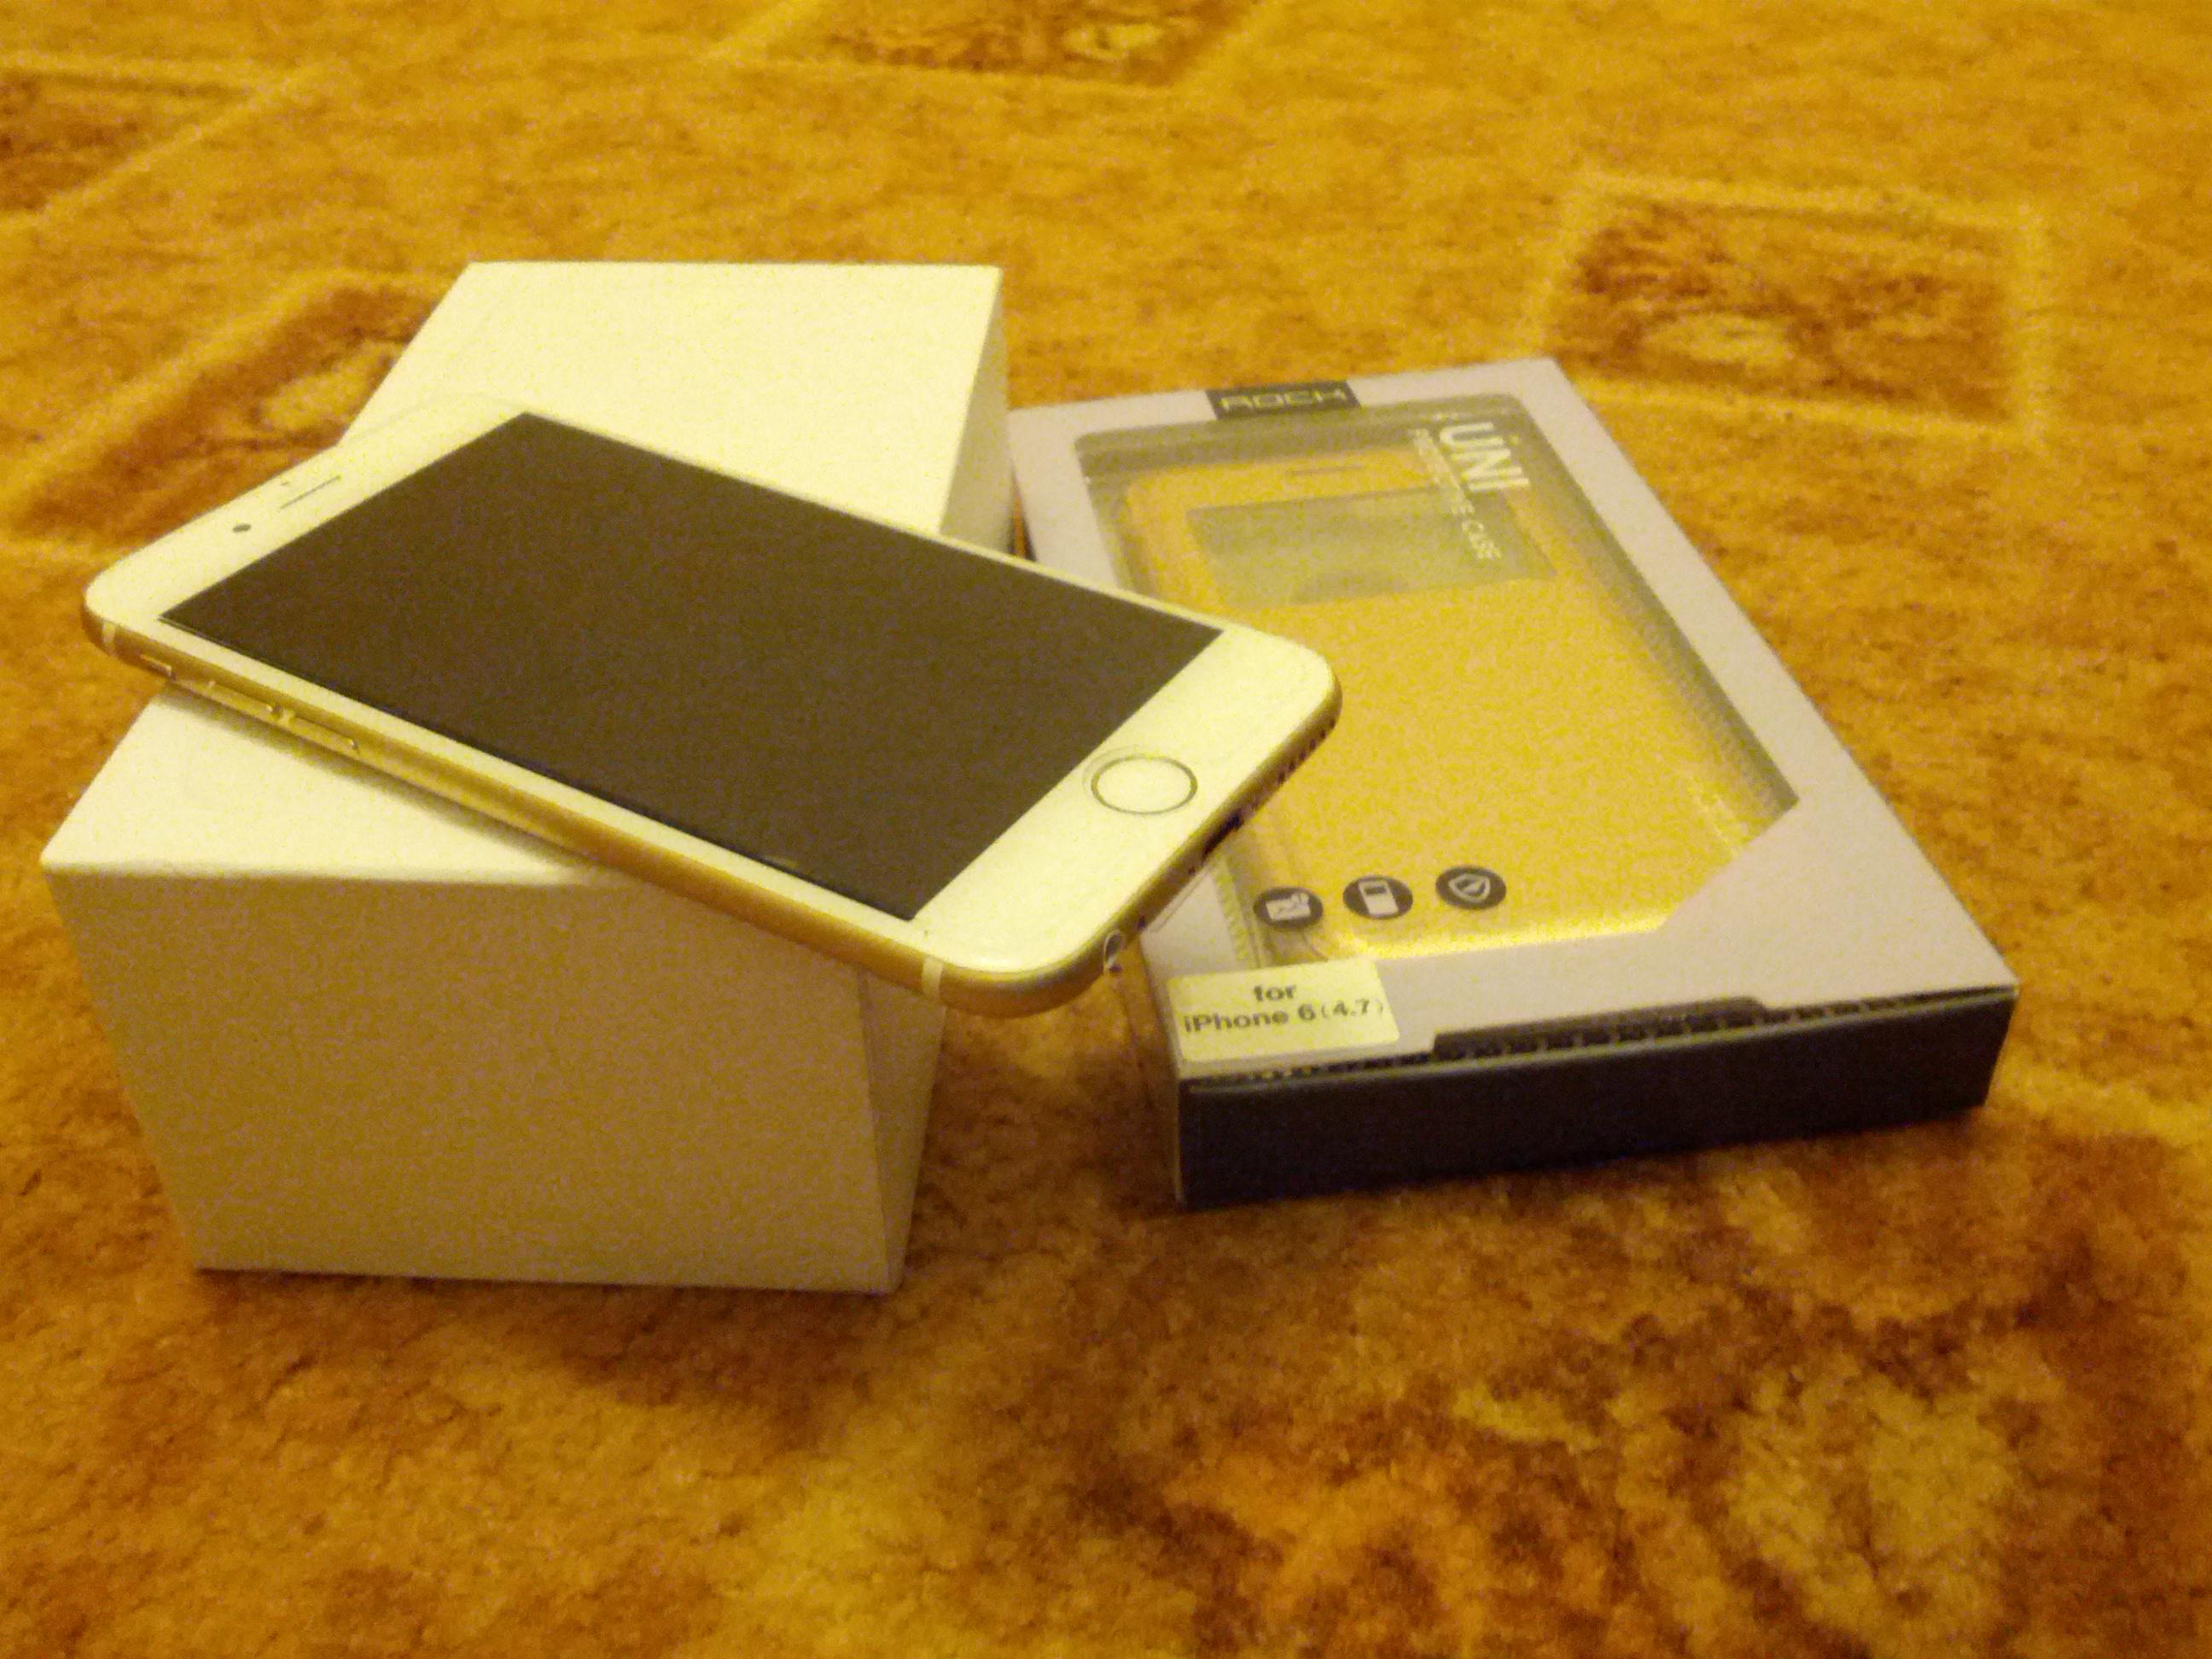 IPhone 6 16 GB Gold colour